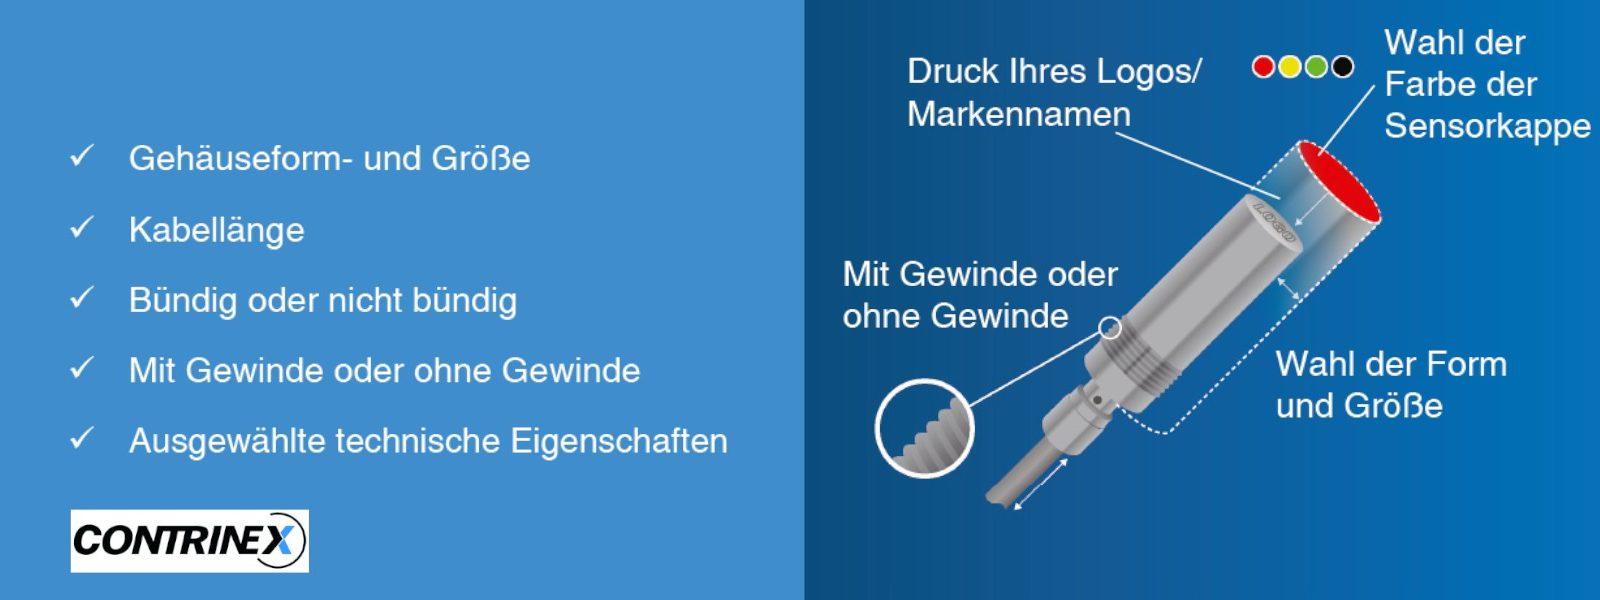 Sensorlösungen maßgeschneidert - Contrinex - Varga Elektronik d.o.o.